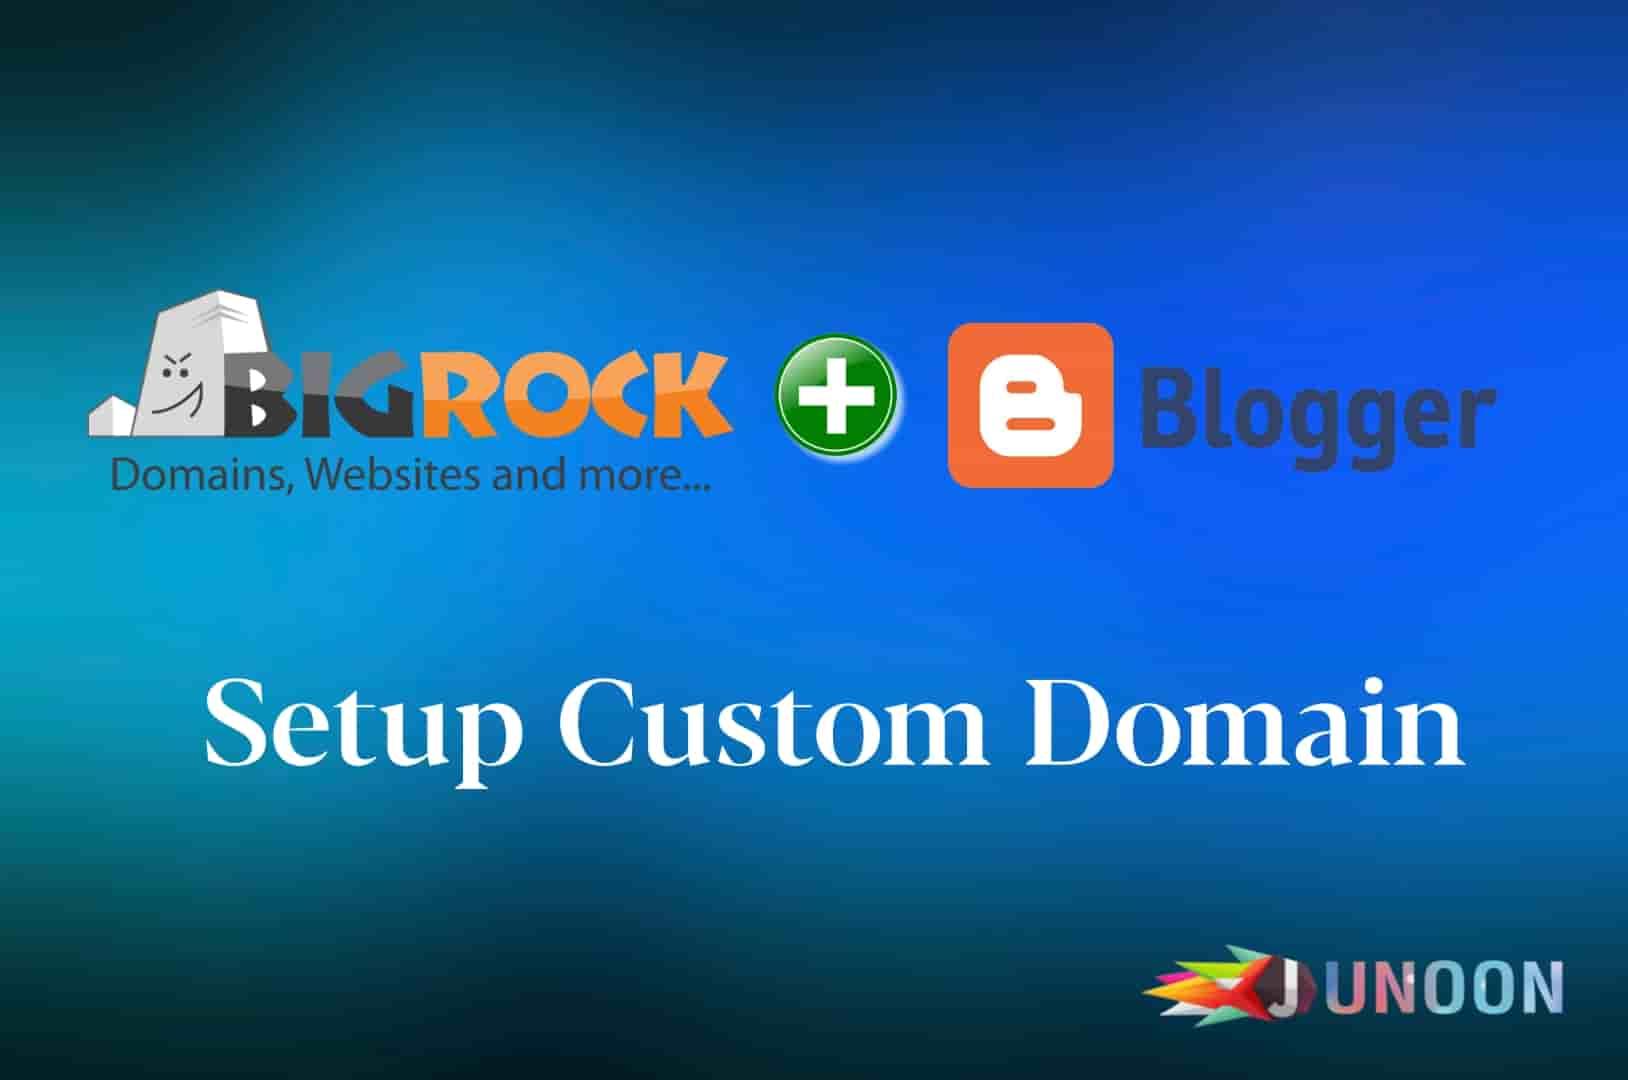 How to setup bigrock custom domain with blogger